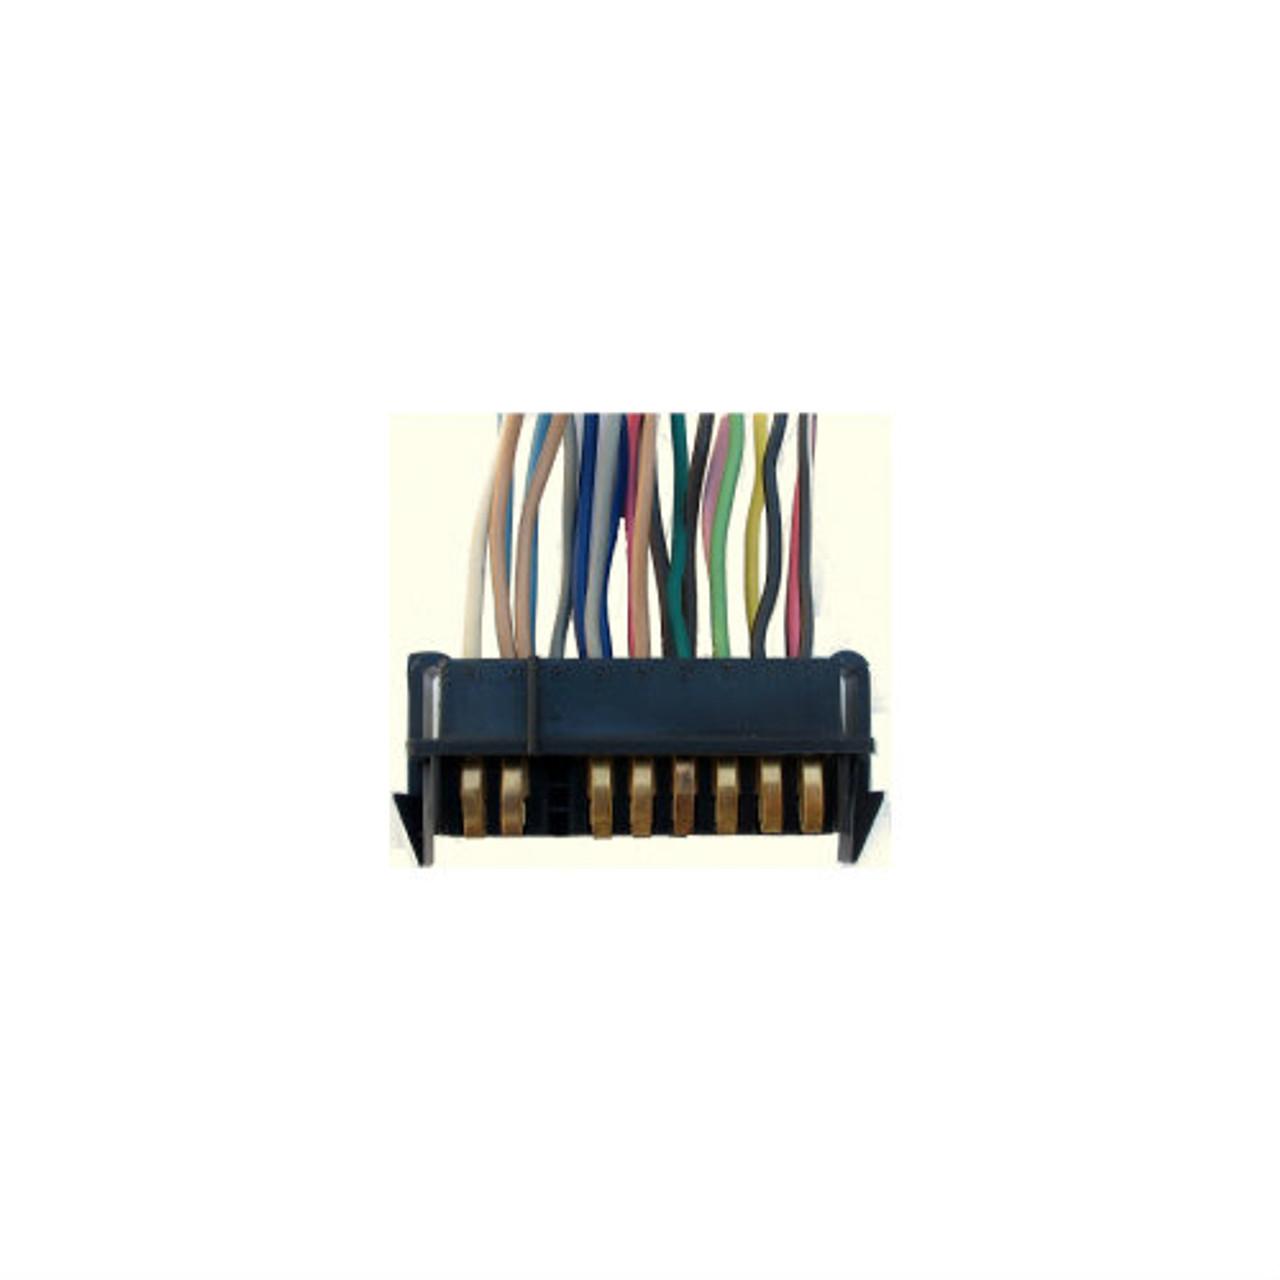 1984-88 Fiero Gauge Cluster Circuit Board Plug (Instruments)